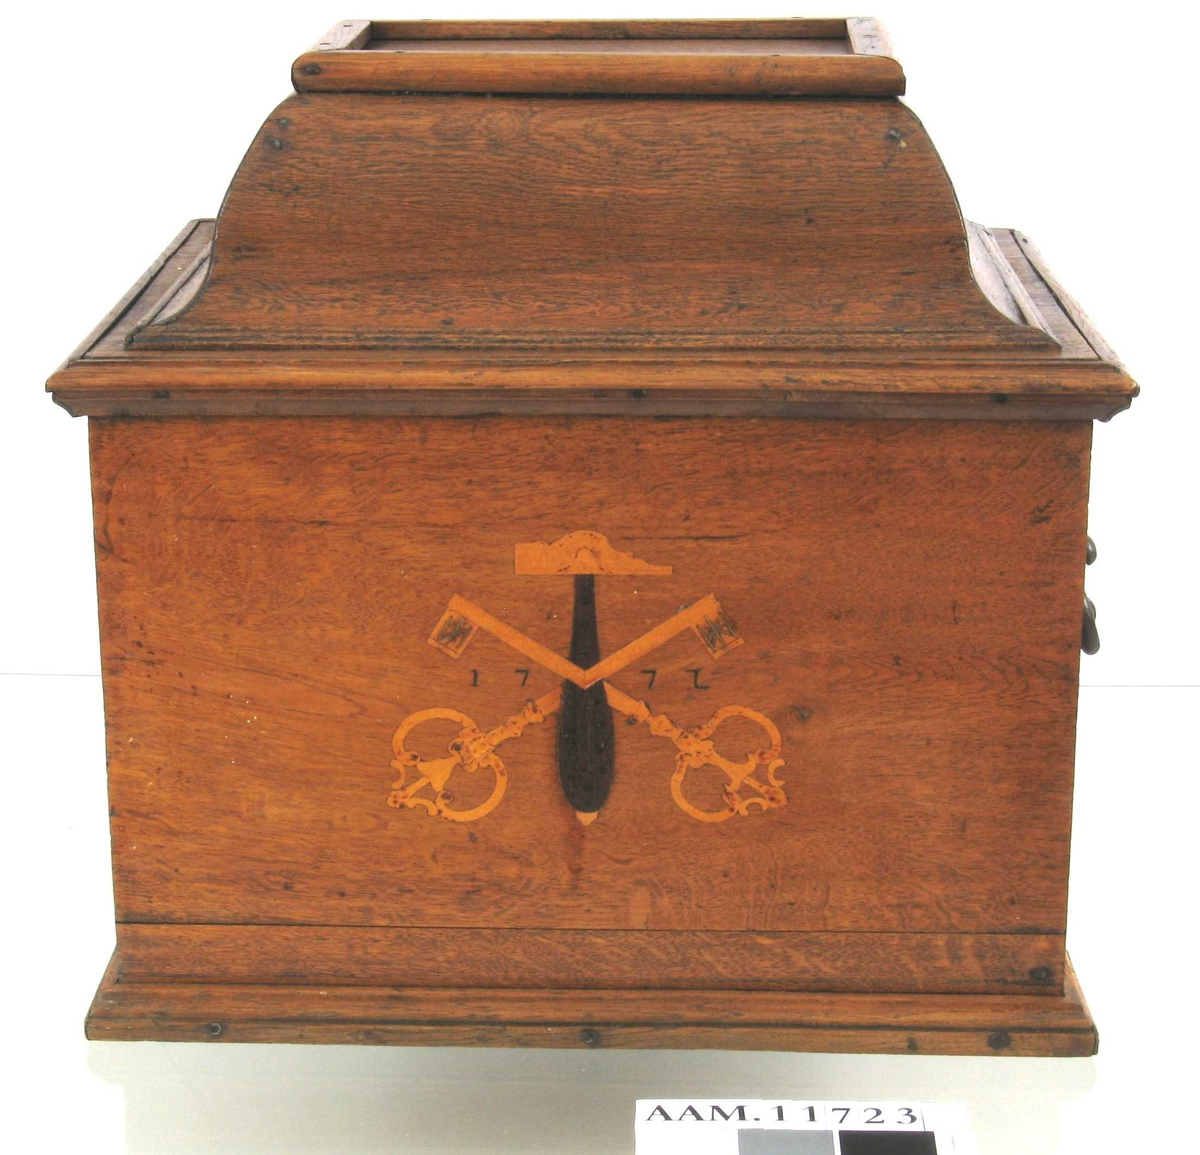 På skrinets forside en hammer med to korslagte nøkler i intarsia og  årstallet 1772.